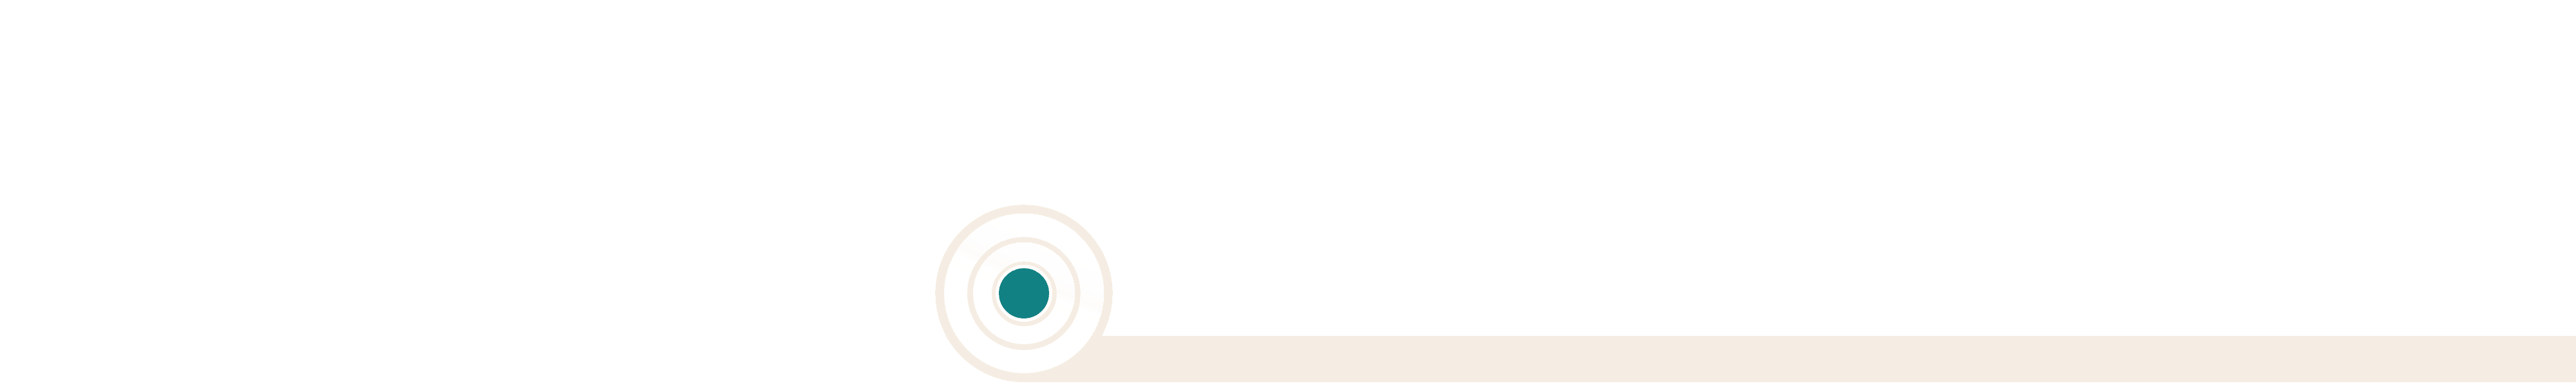 fond-slide-srd cercle